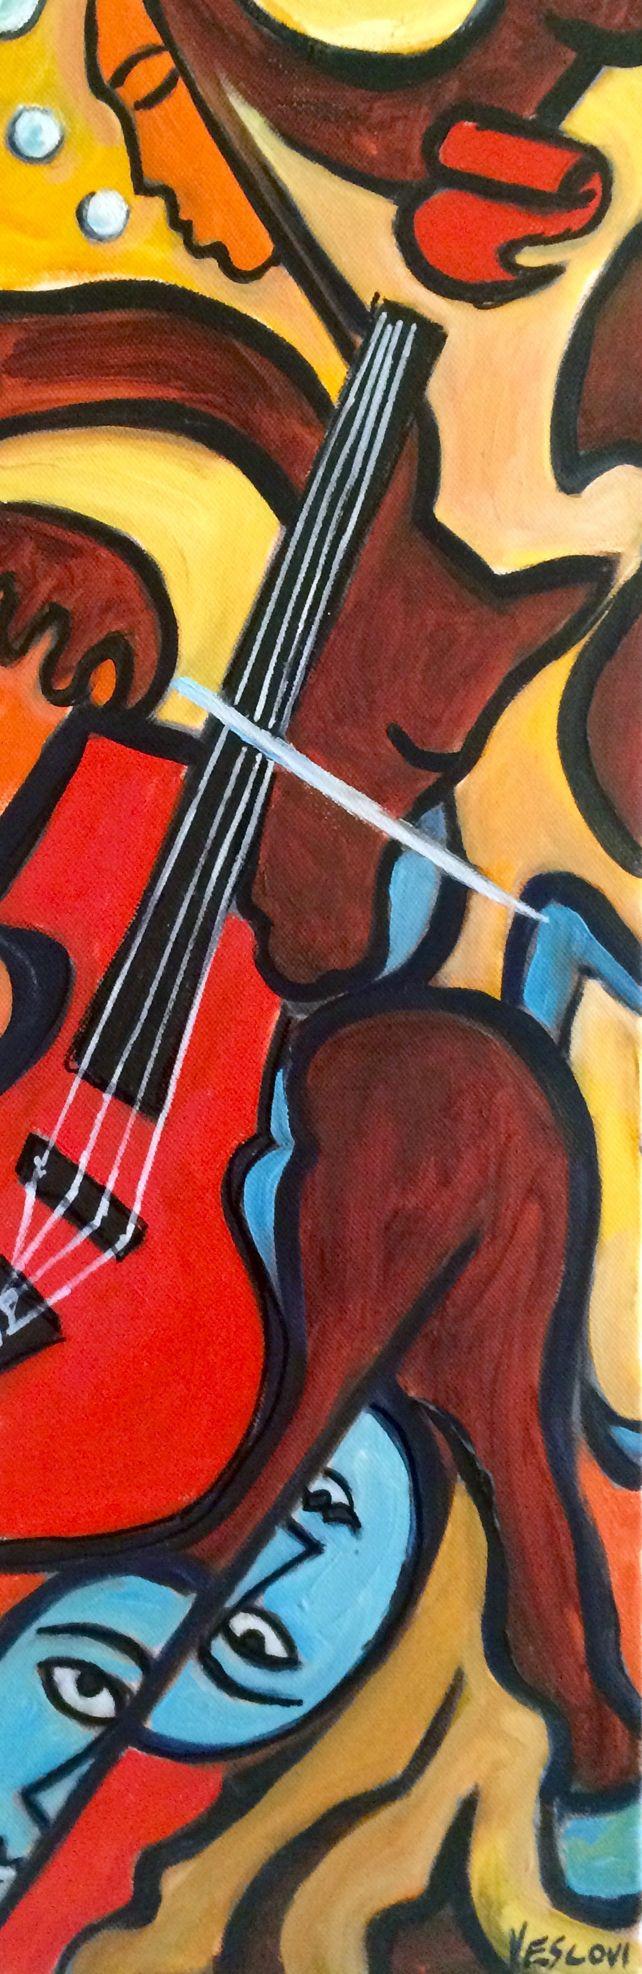 The Horse Cellist